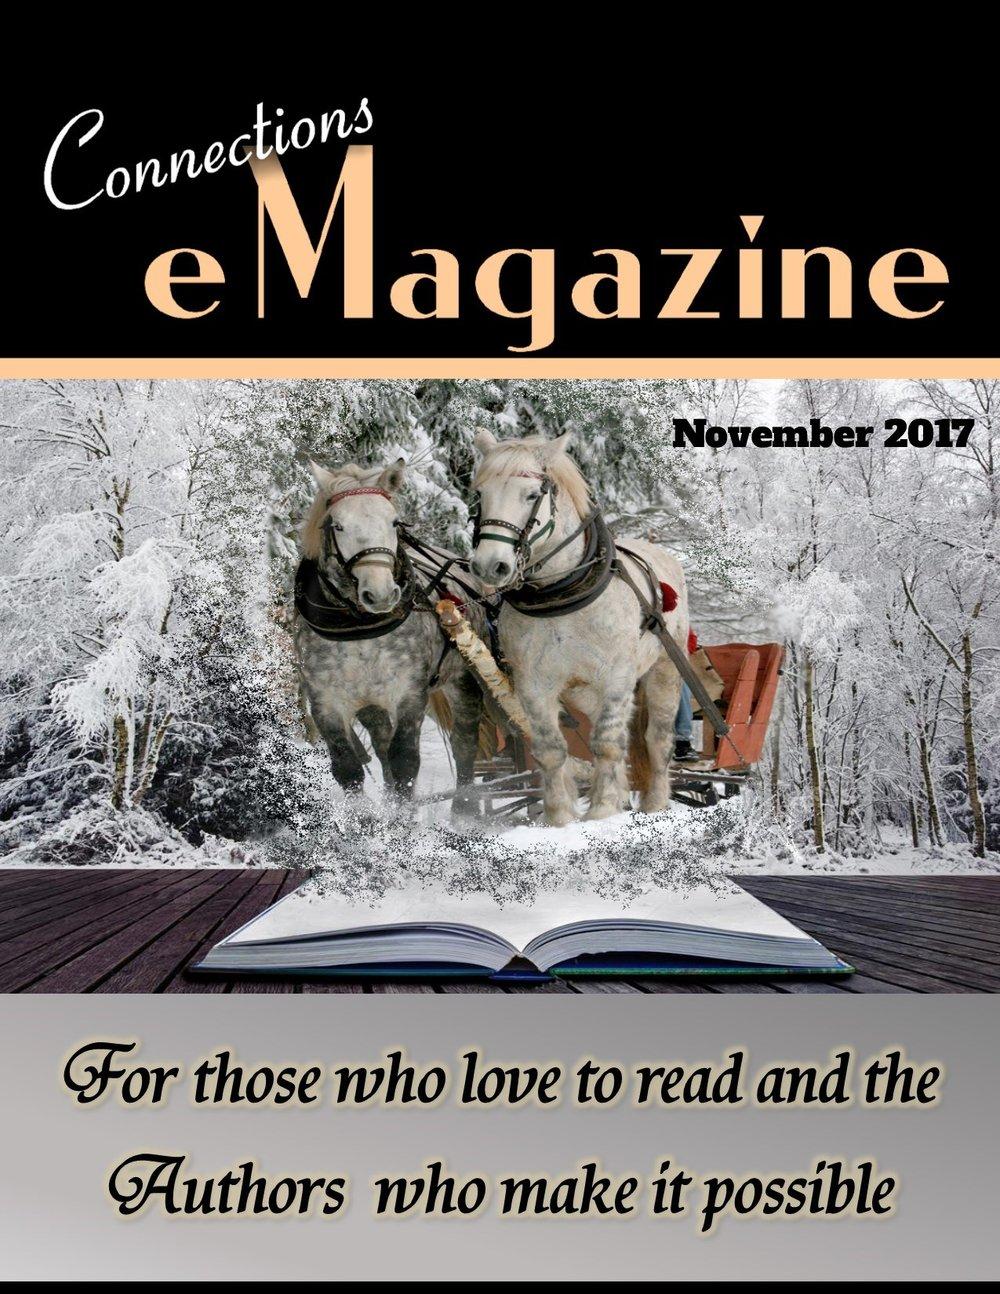 mpsmith-publishing-connections-emagazine-november-2017_Page_001.jpg